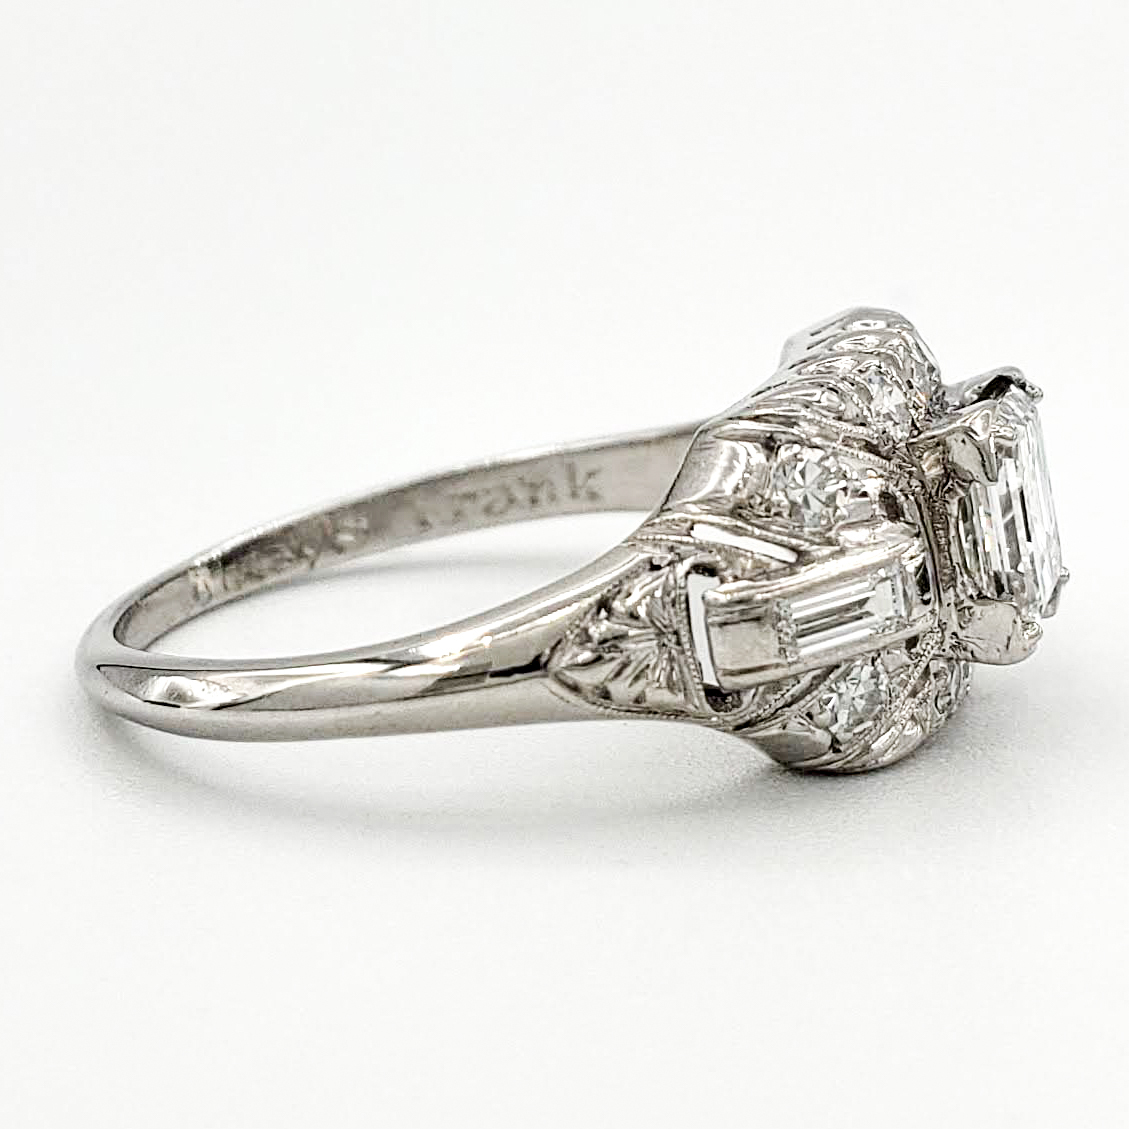 vintage-platinum-engagement-ring-with-0-69-carat-asscher-cut-diamond-gia-f-si1